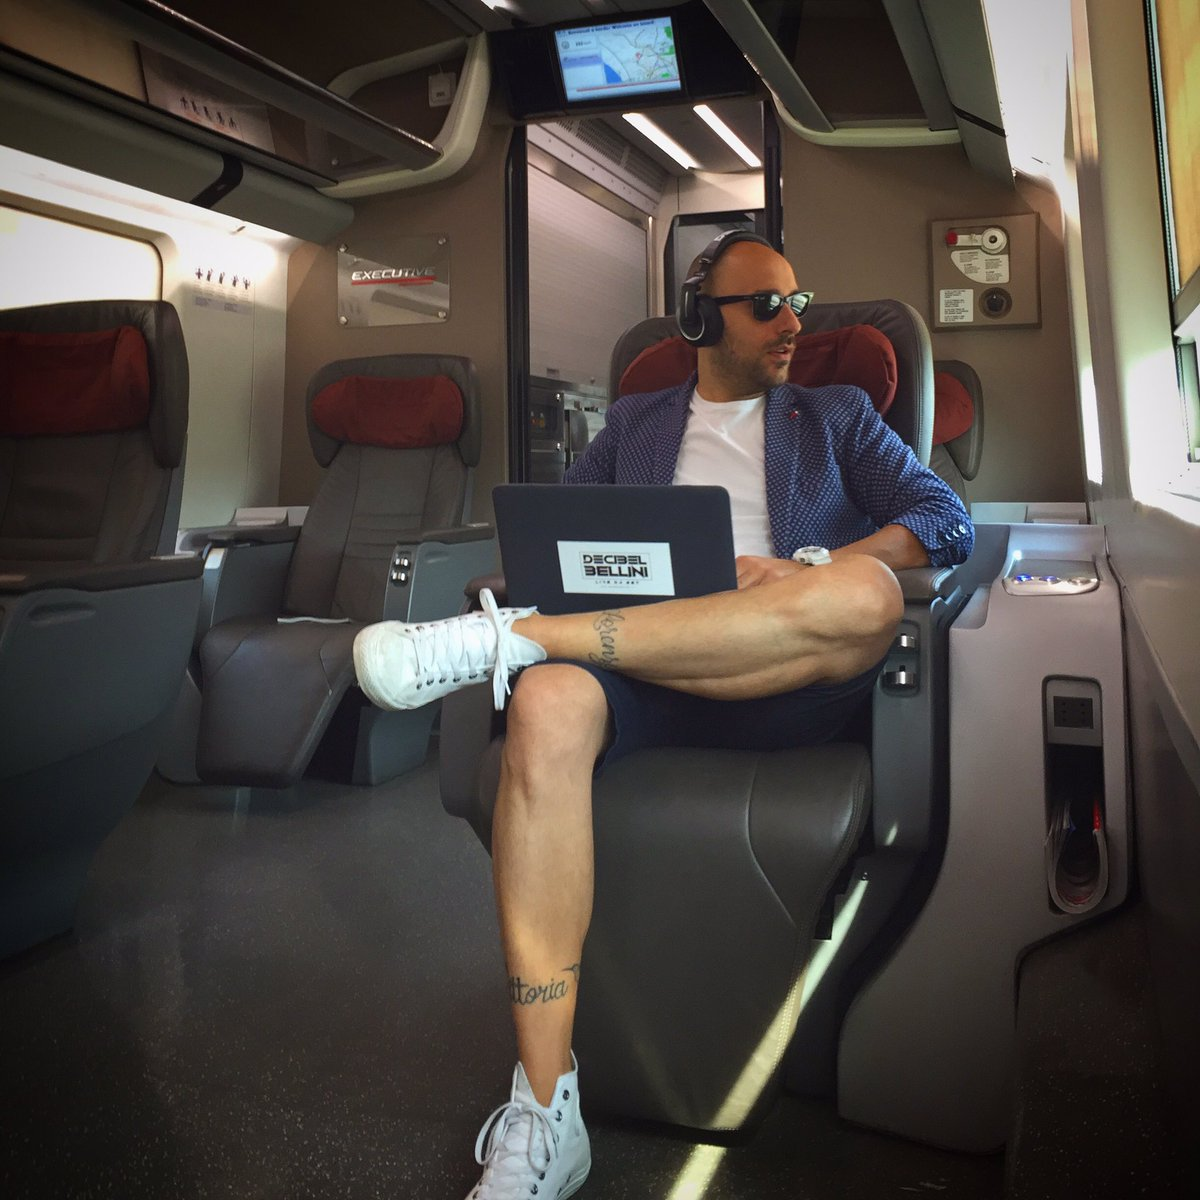 On my way to Bologna #ManoloMartina #Gabbiadini #Wedding #DJ #DJSet #Party #DecibelBellini <br>http://pic.twitter.com/k10m55ENYw